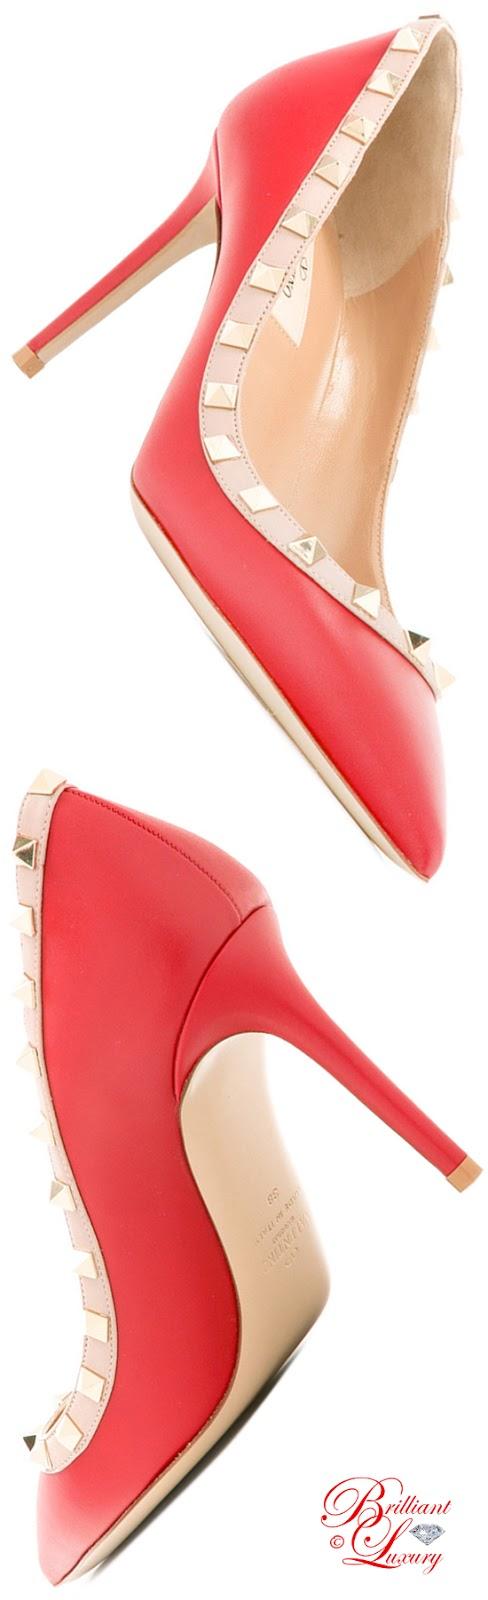 Brilliant Luxury ♦ Valentino Garavani Rockstud Pumps #red